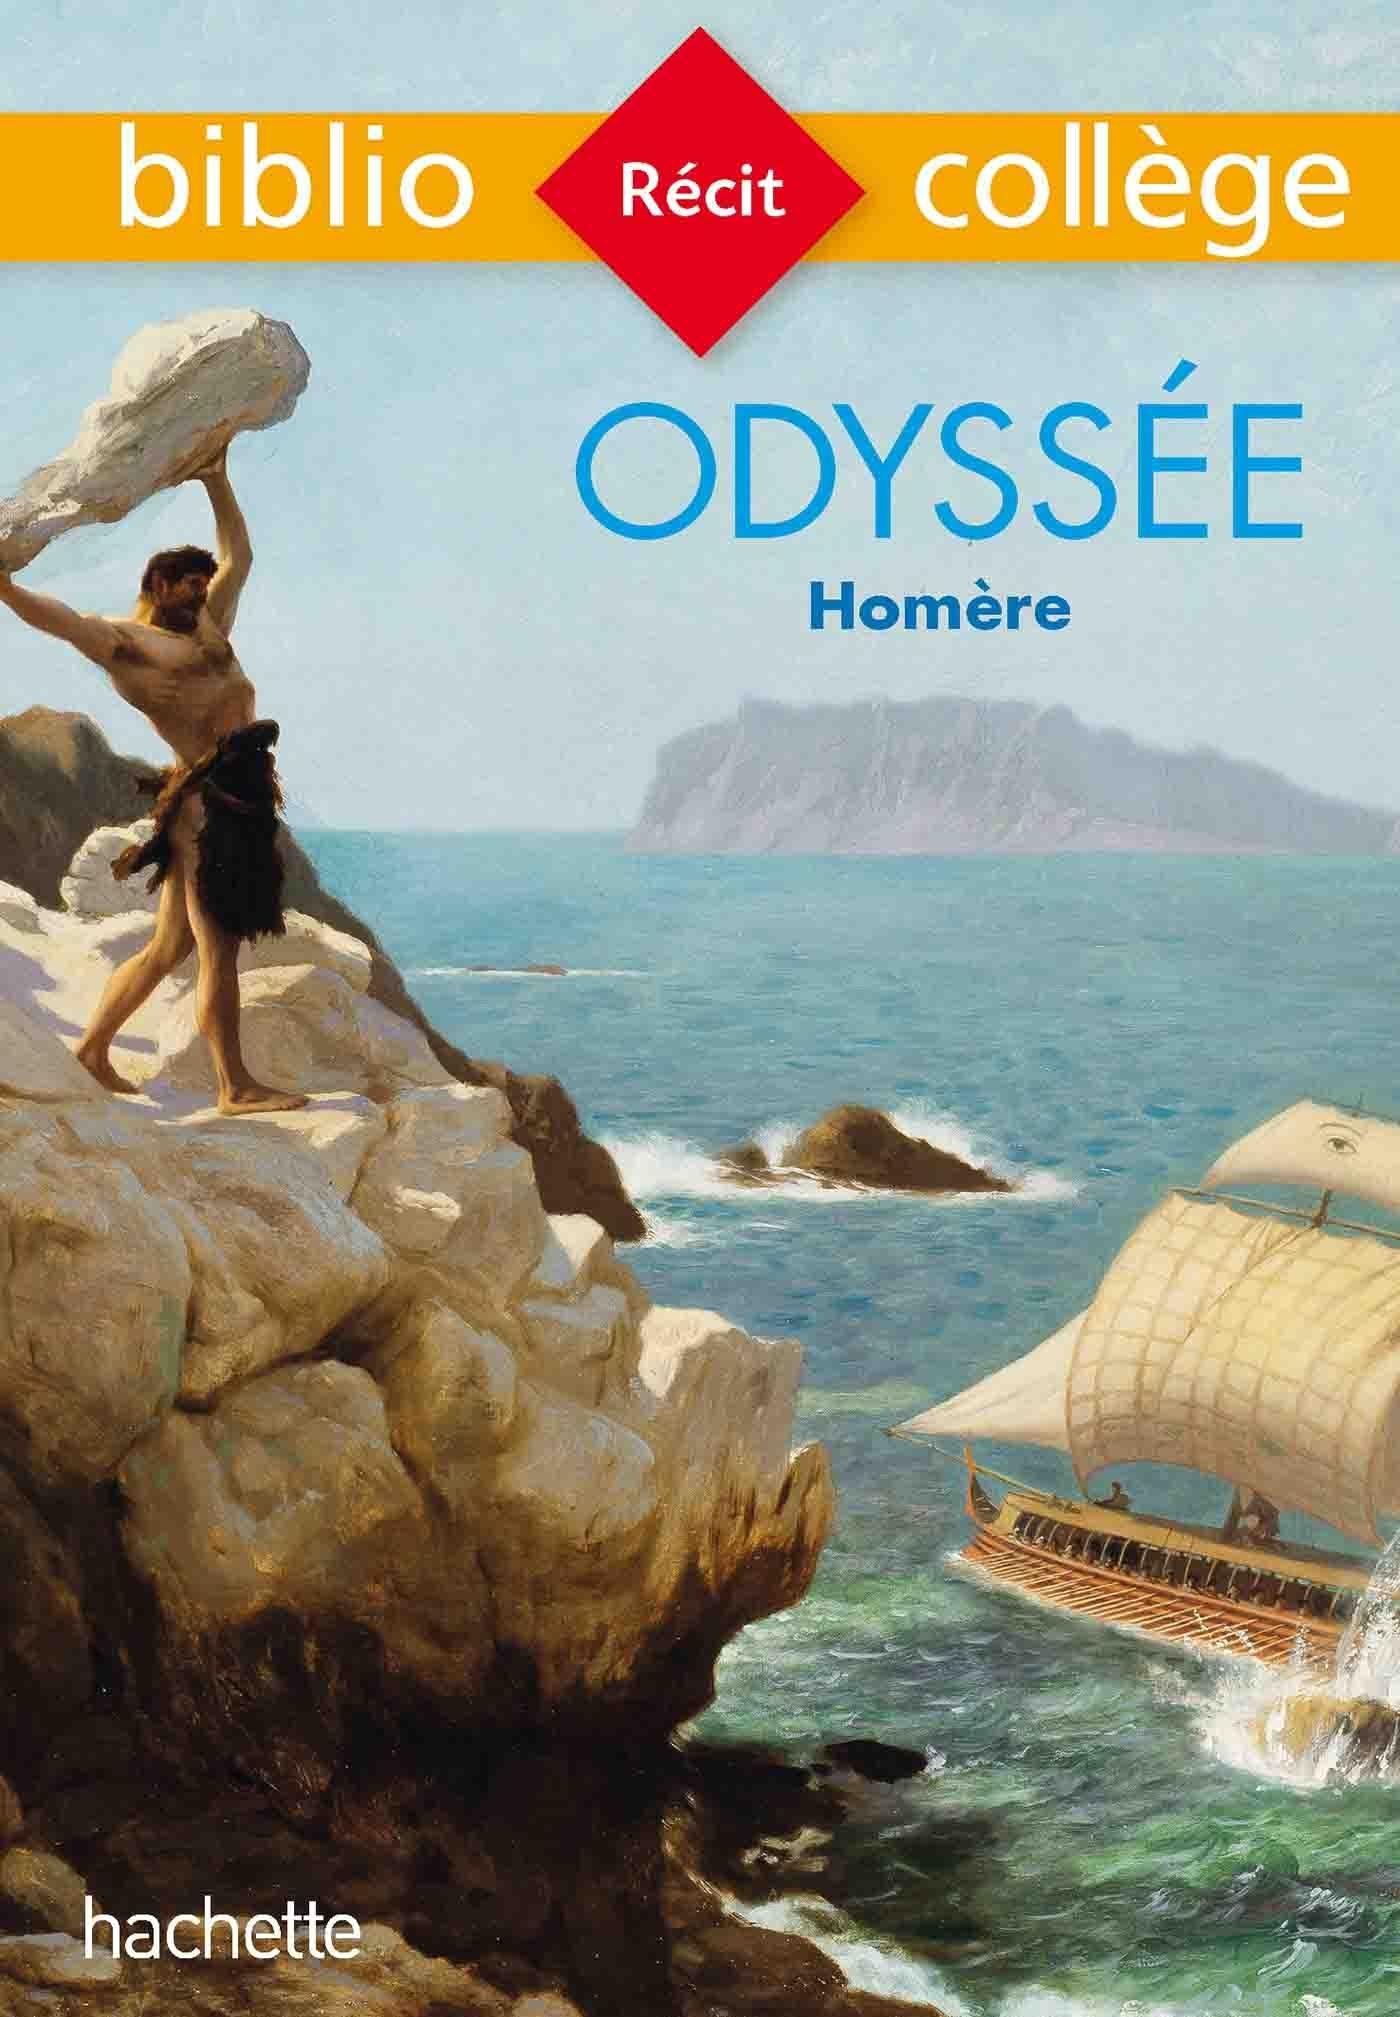 BIBLIOCOLLEGE - ODYSSEE, HOMERE